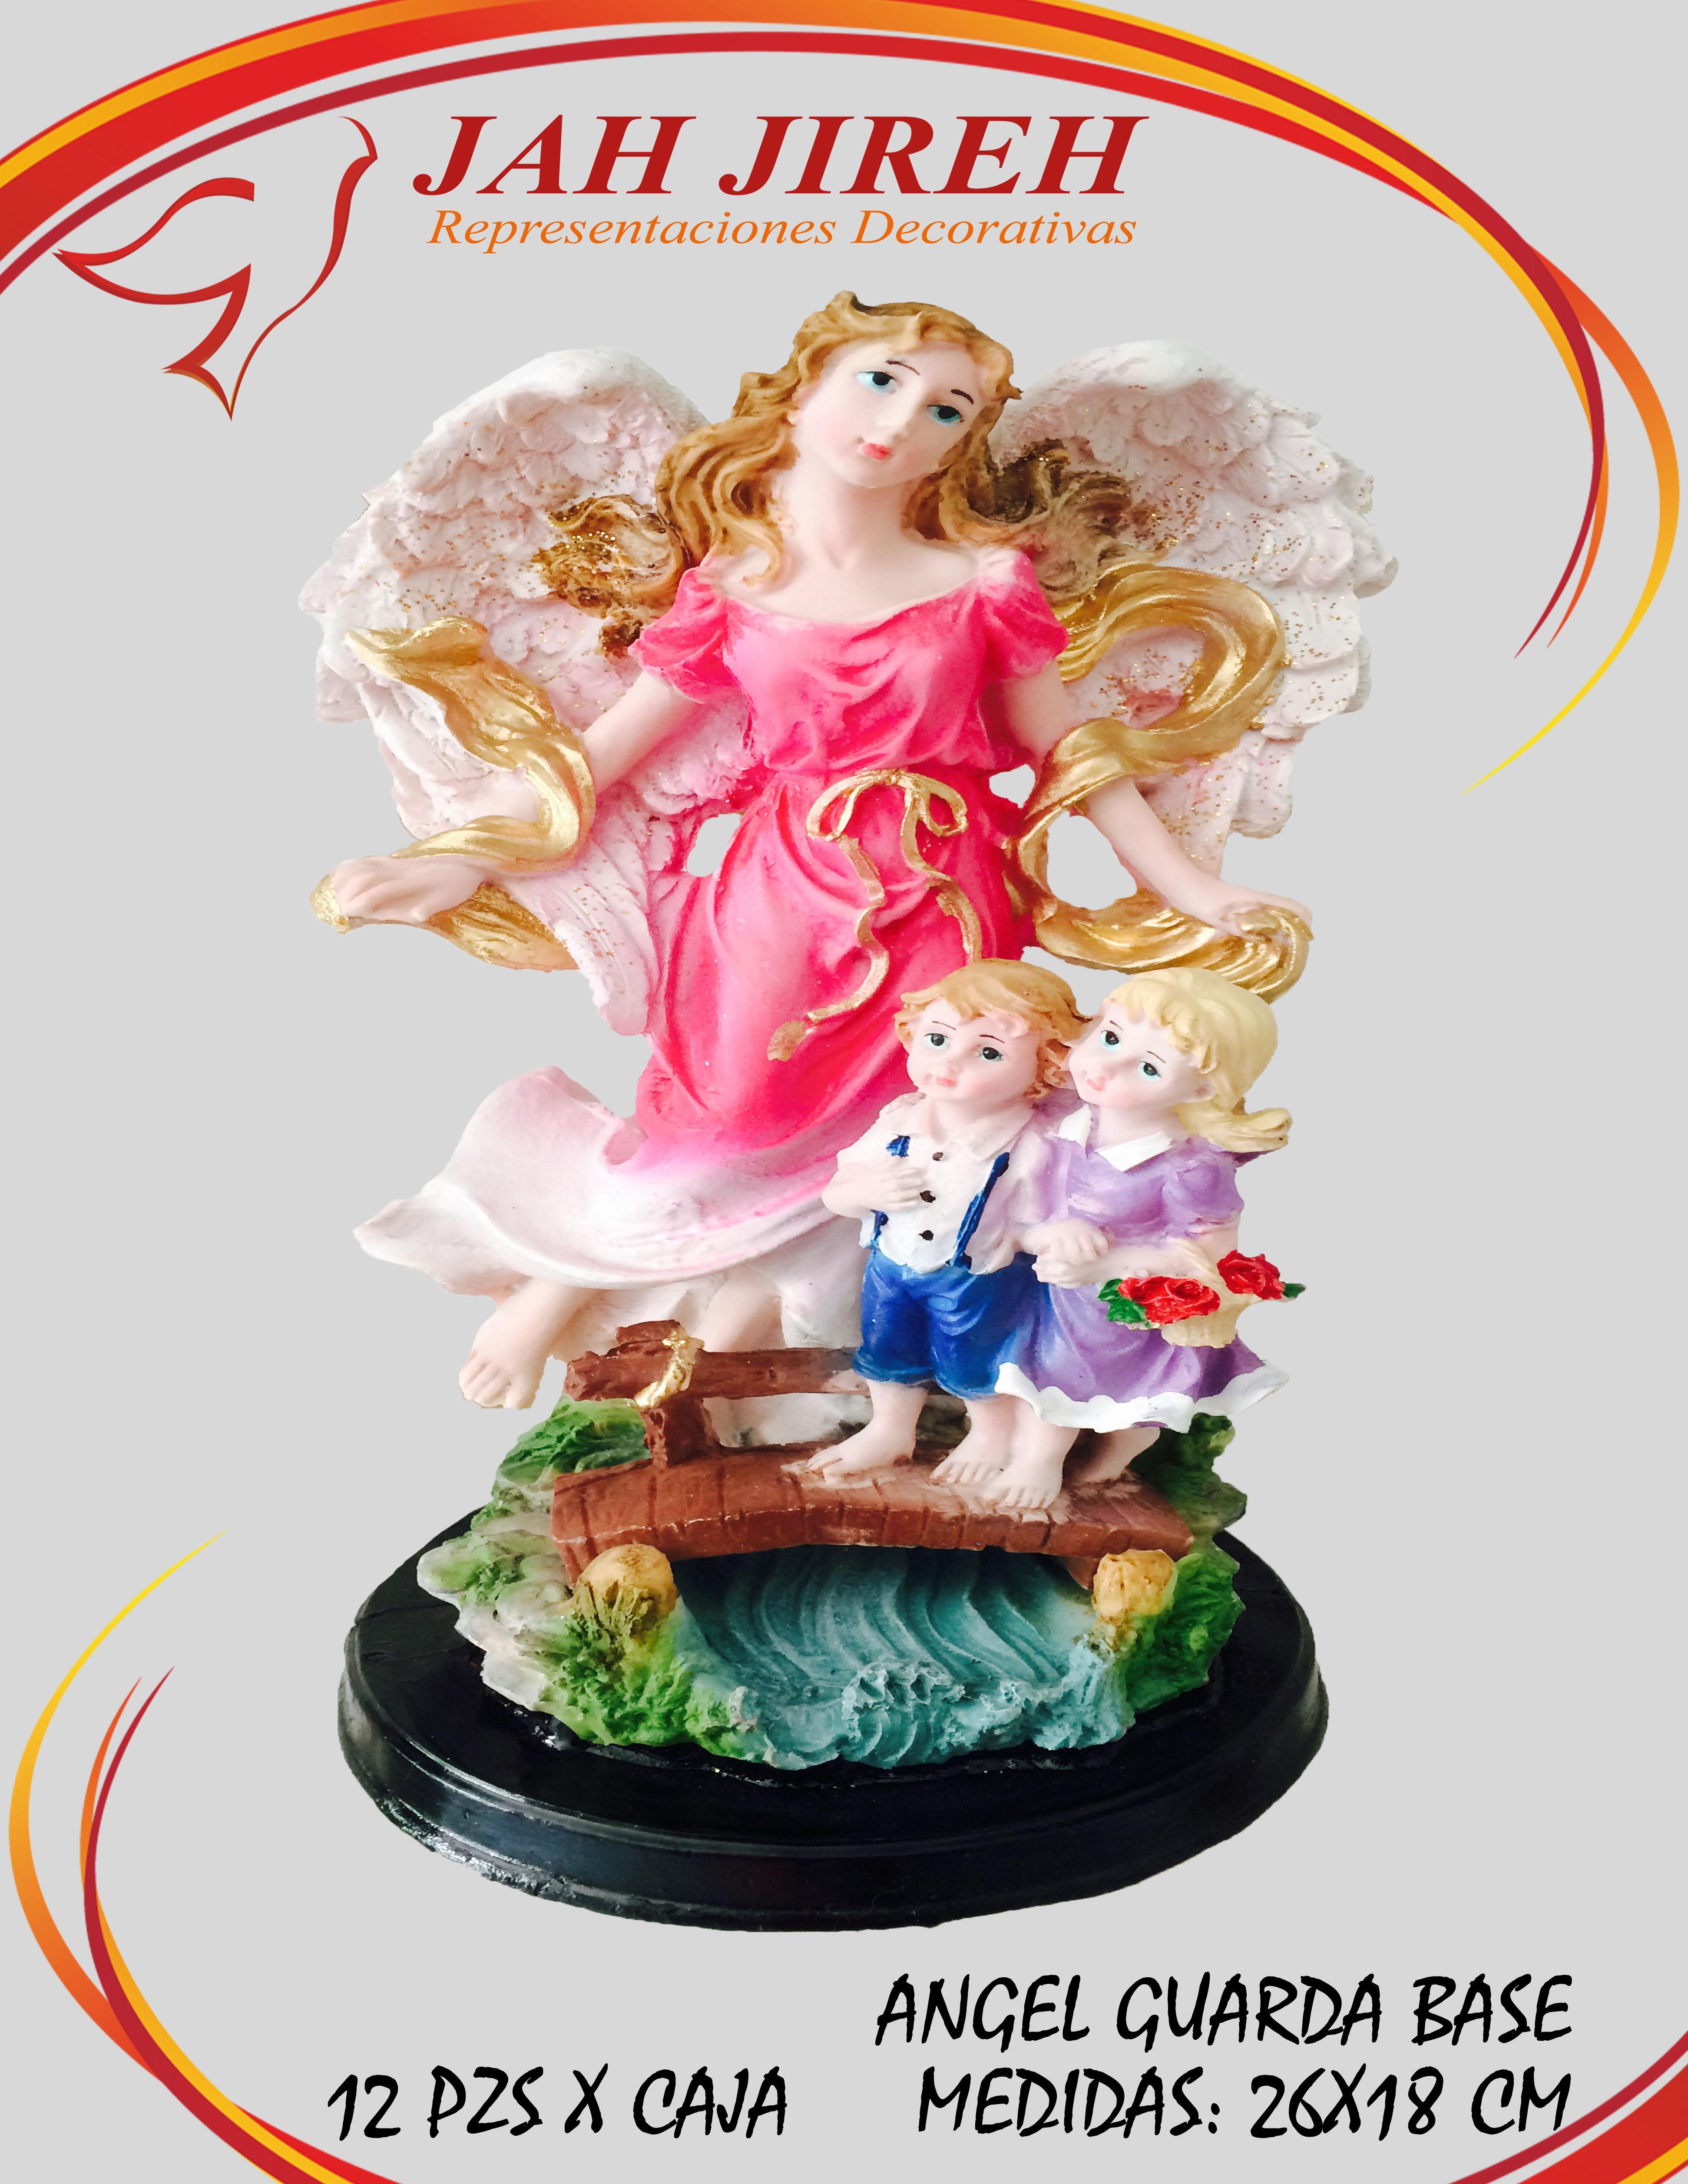 https://0201.nccdn.net/1_2/000/000/163/bd5/angel--guarda-base.jpg